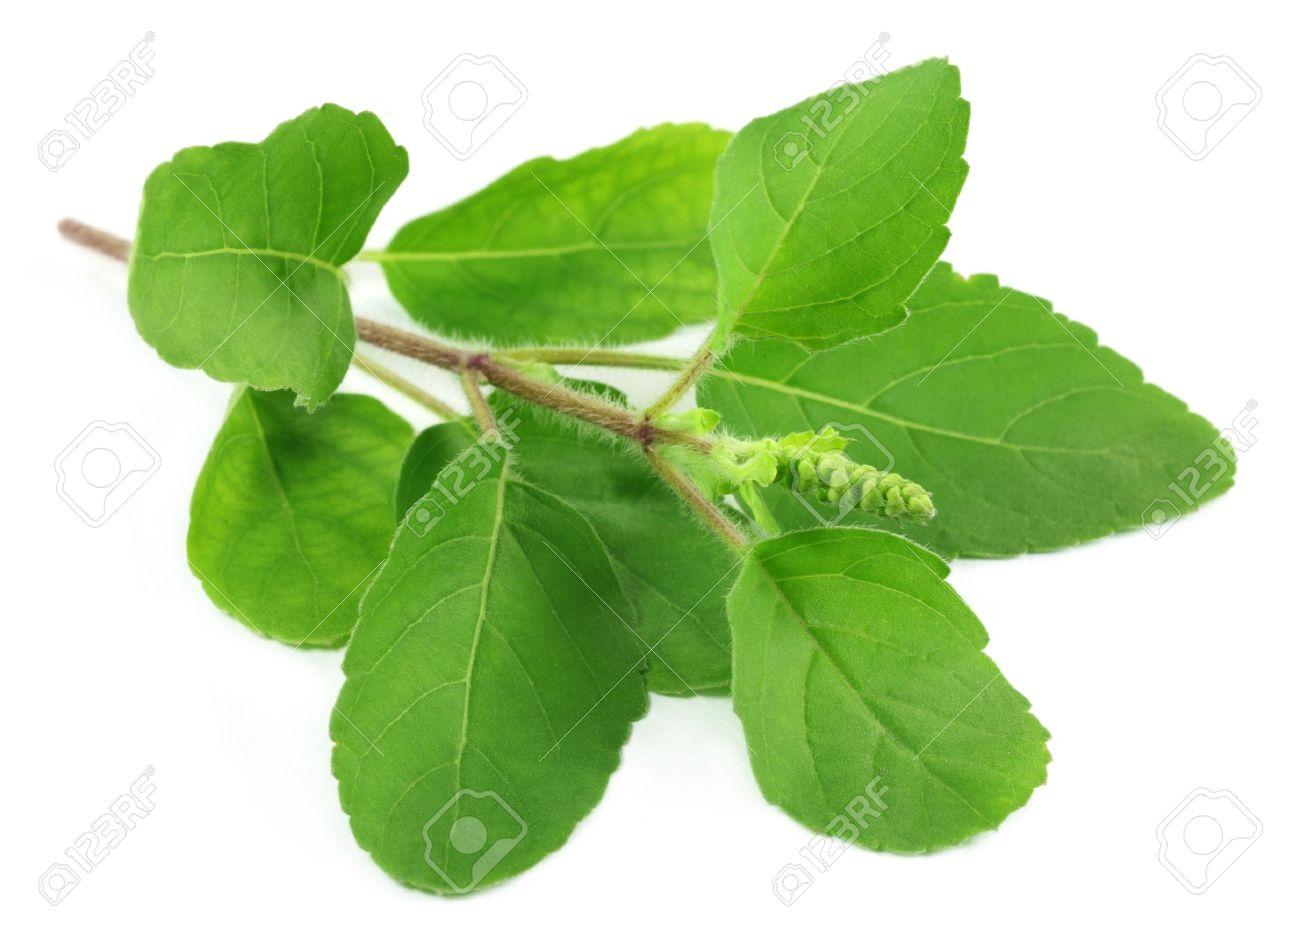 Tulsi Medicinal Plant Medicinal Holy Basil or Tulsi